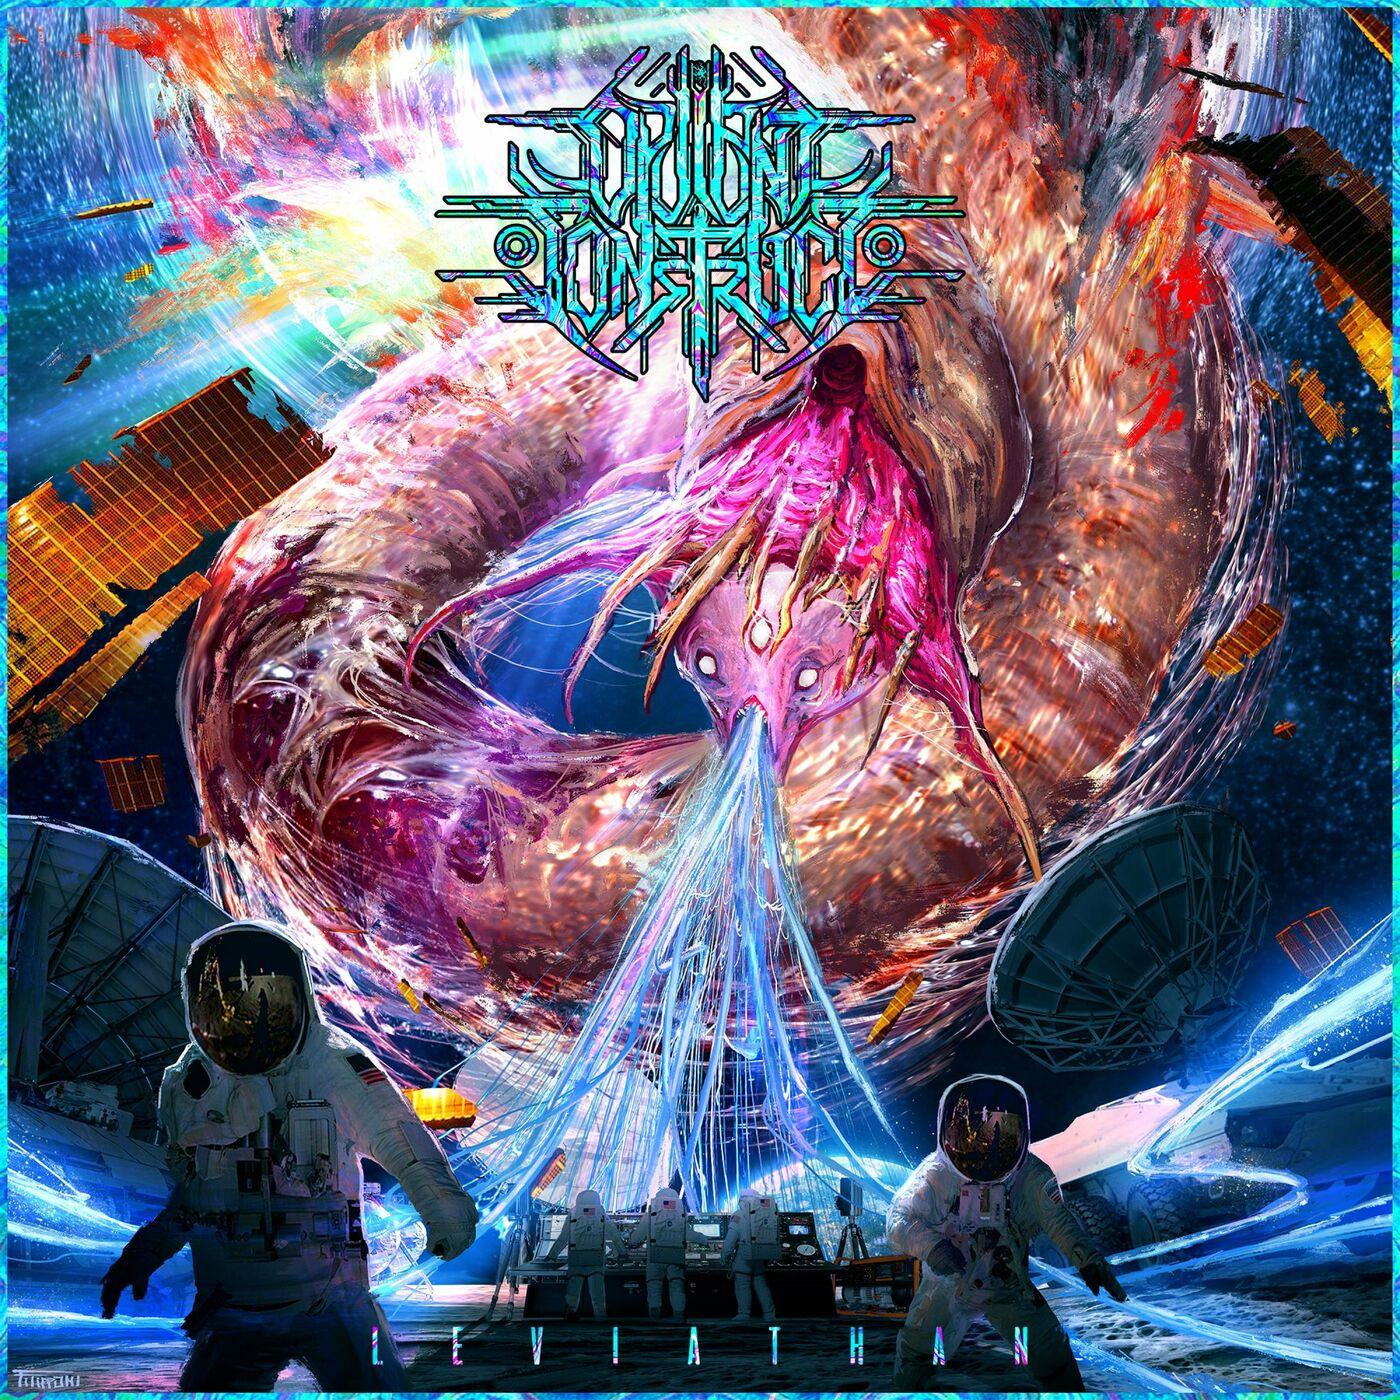 Opulent Construct - Leviathan [single] (2020)